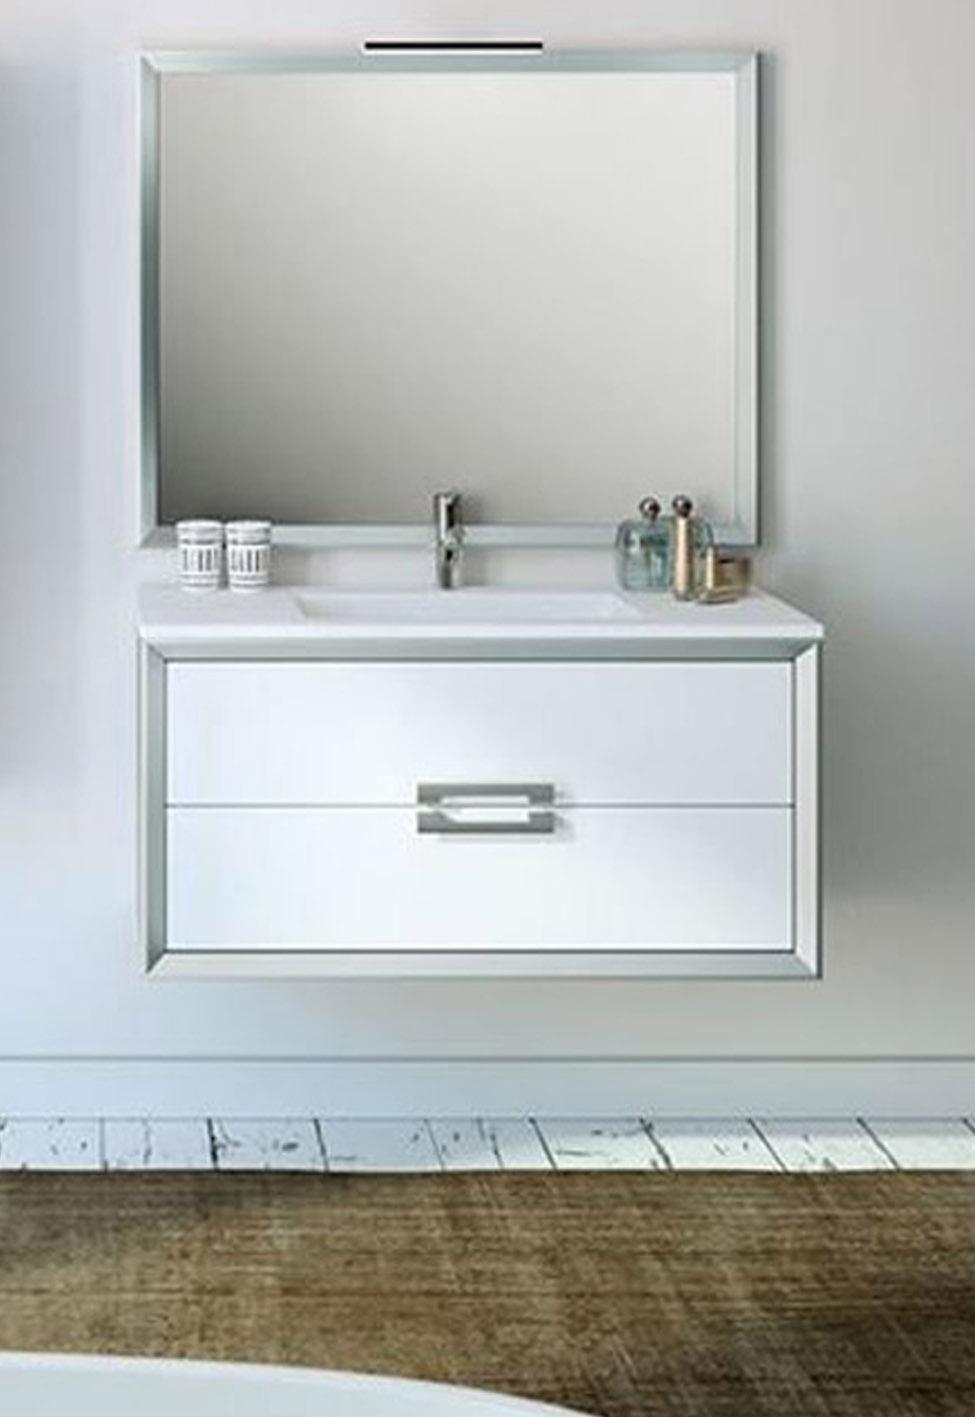 "40"" Single Sink Bathroom Vanity 2 Drawer Ceramic Sink with 4 Color Options"